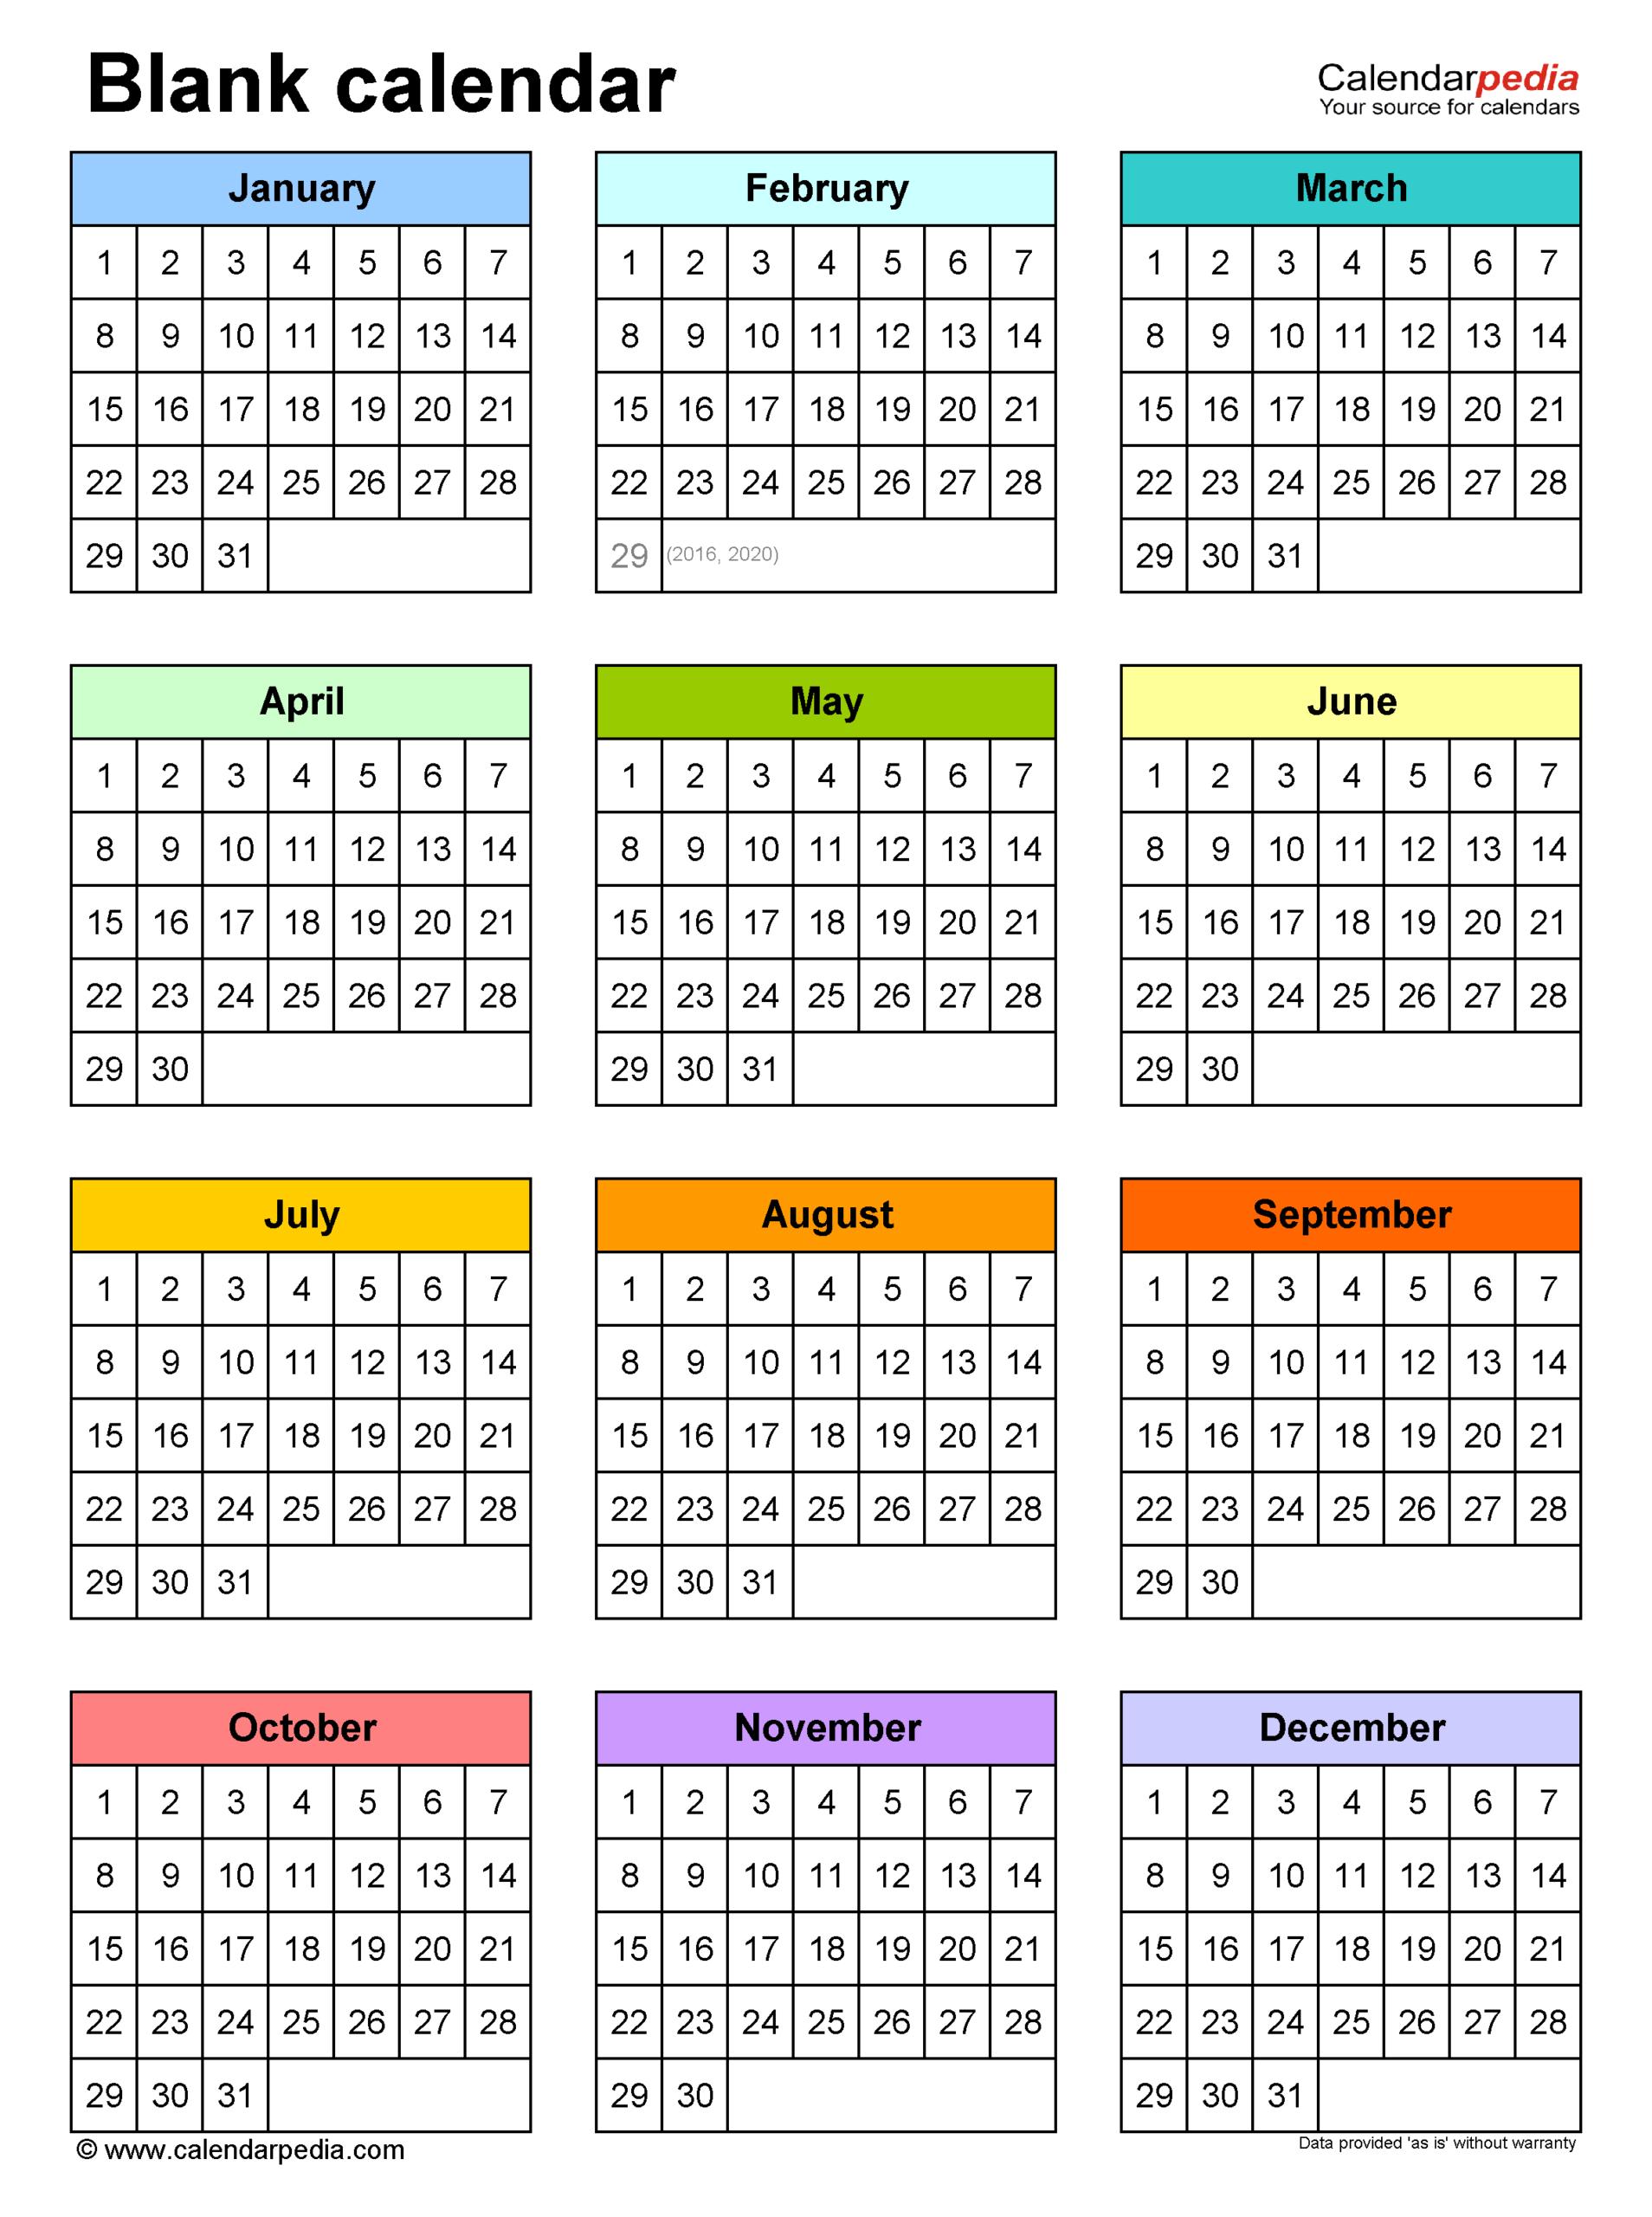 Blank Calendars - Free Printable Microsoft Excel Templates